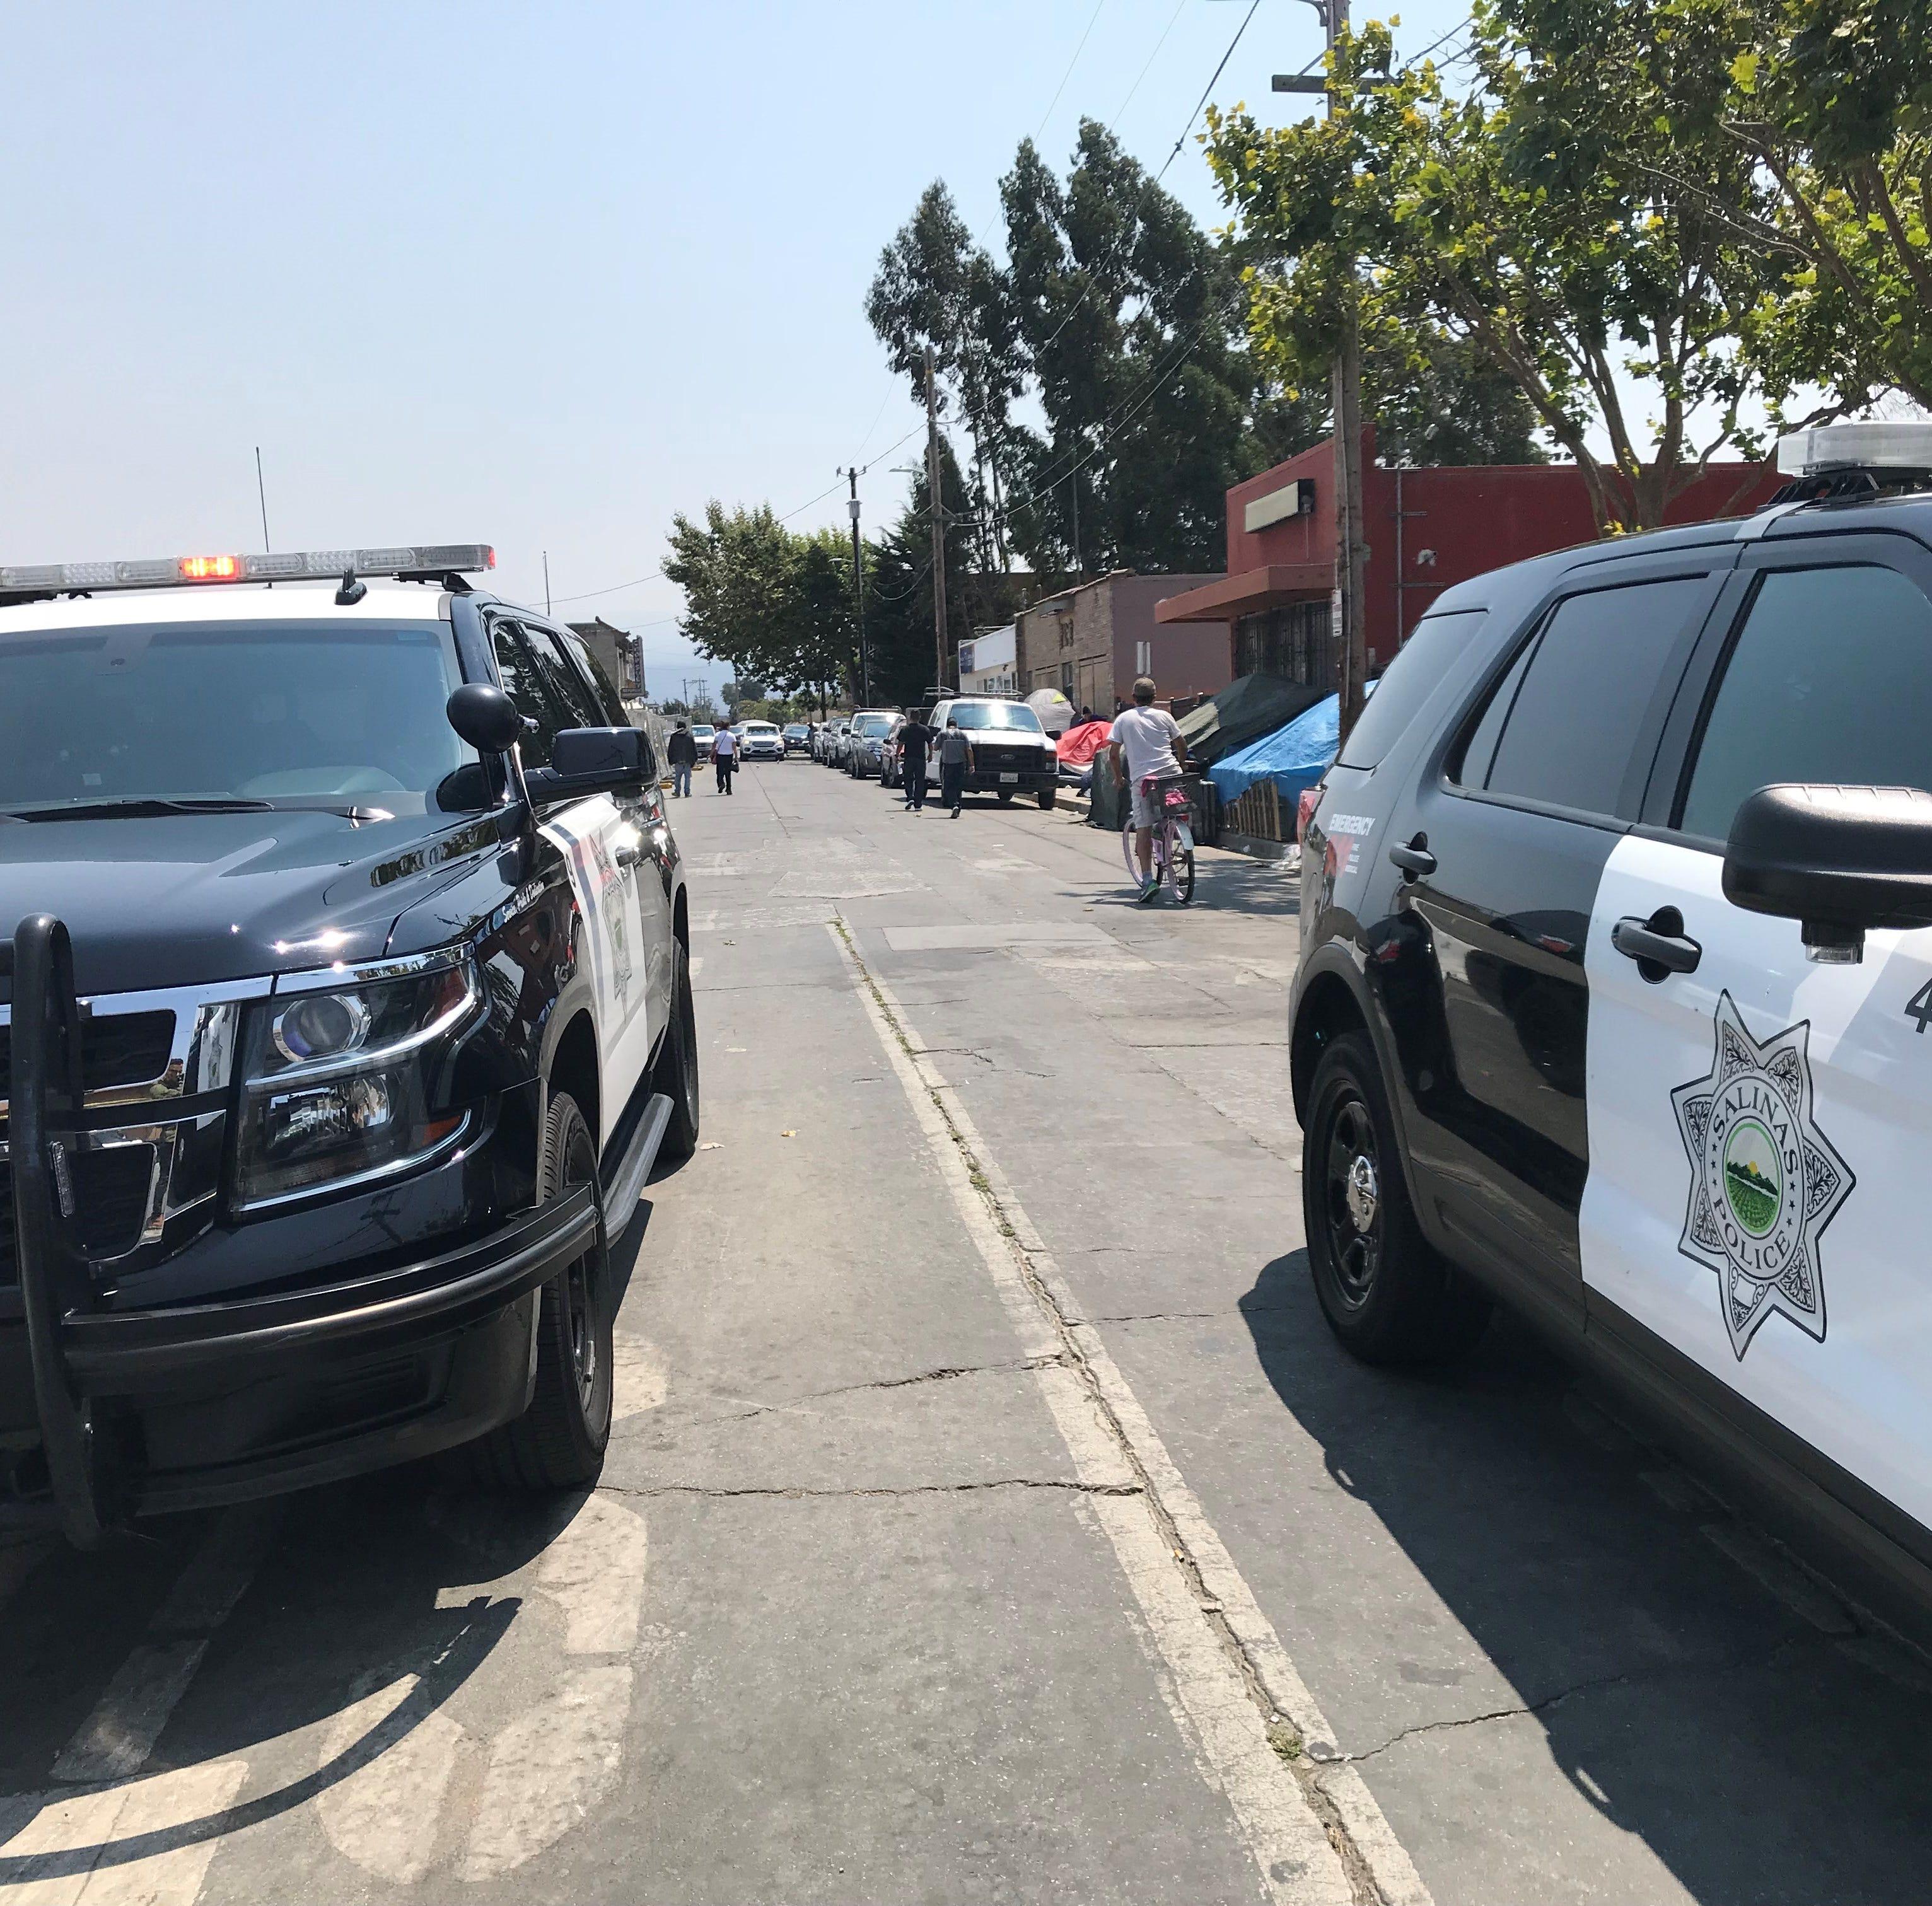 UPDATE Salinas gunshot report investigated as self-inflicted groin wound